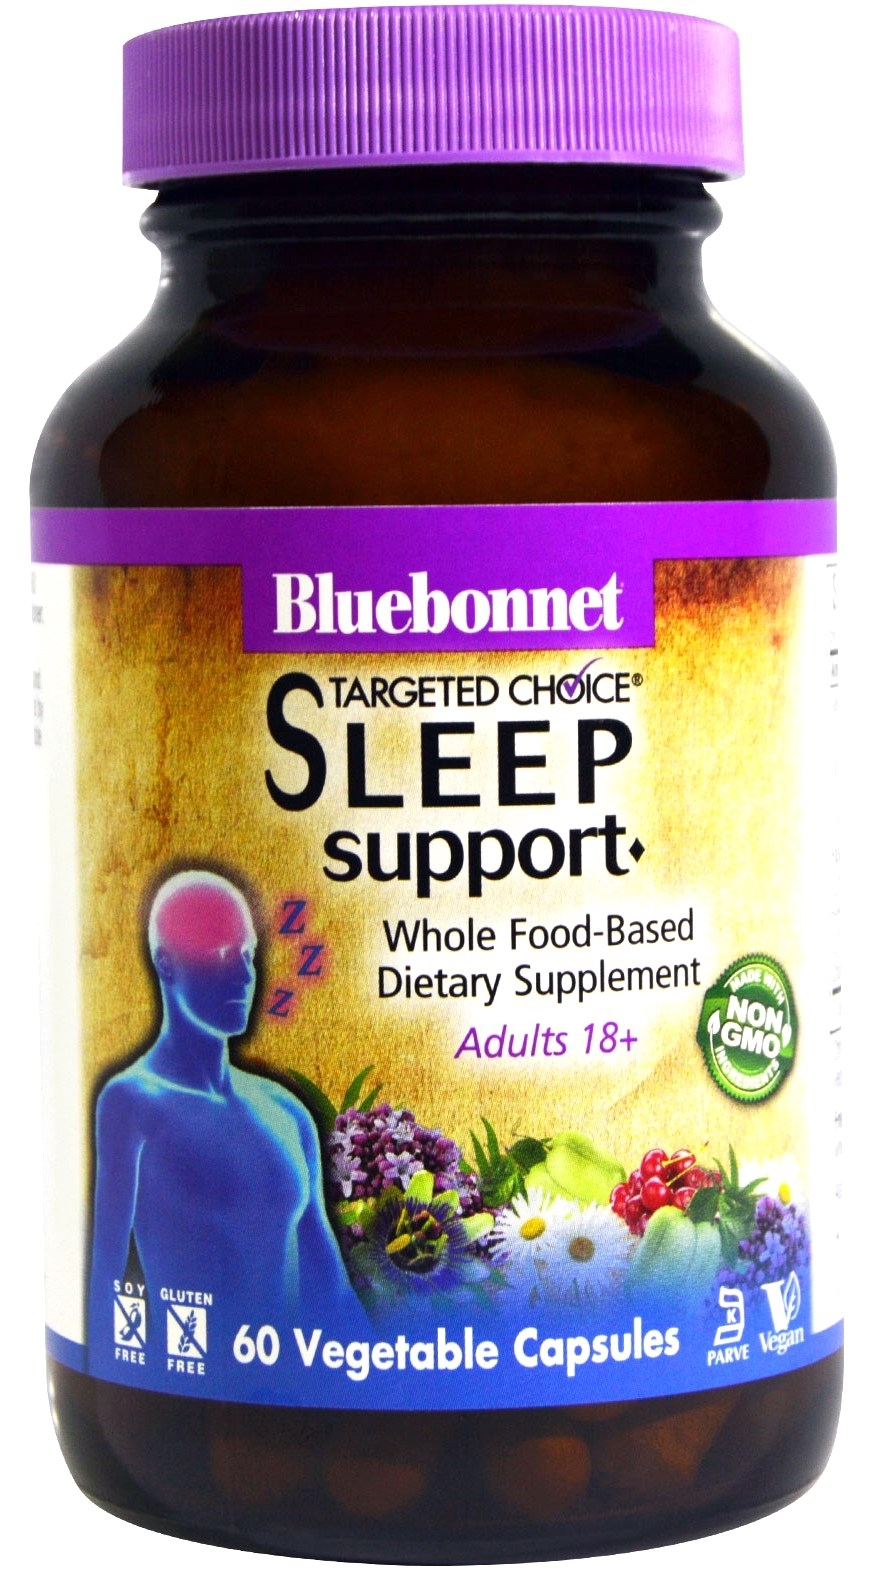 Bluebonnet Sleep Support - Targeted Choice 30 cápsulas